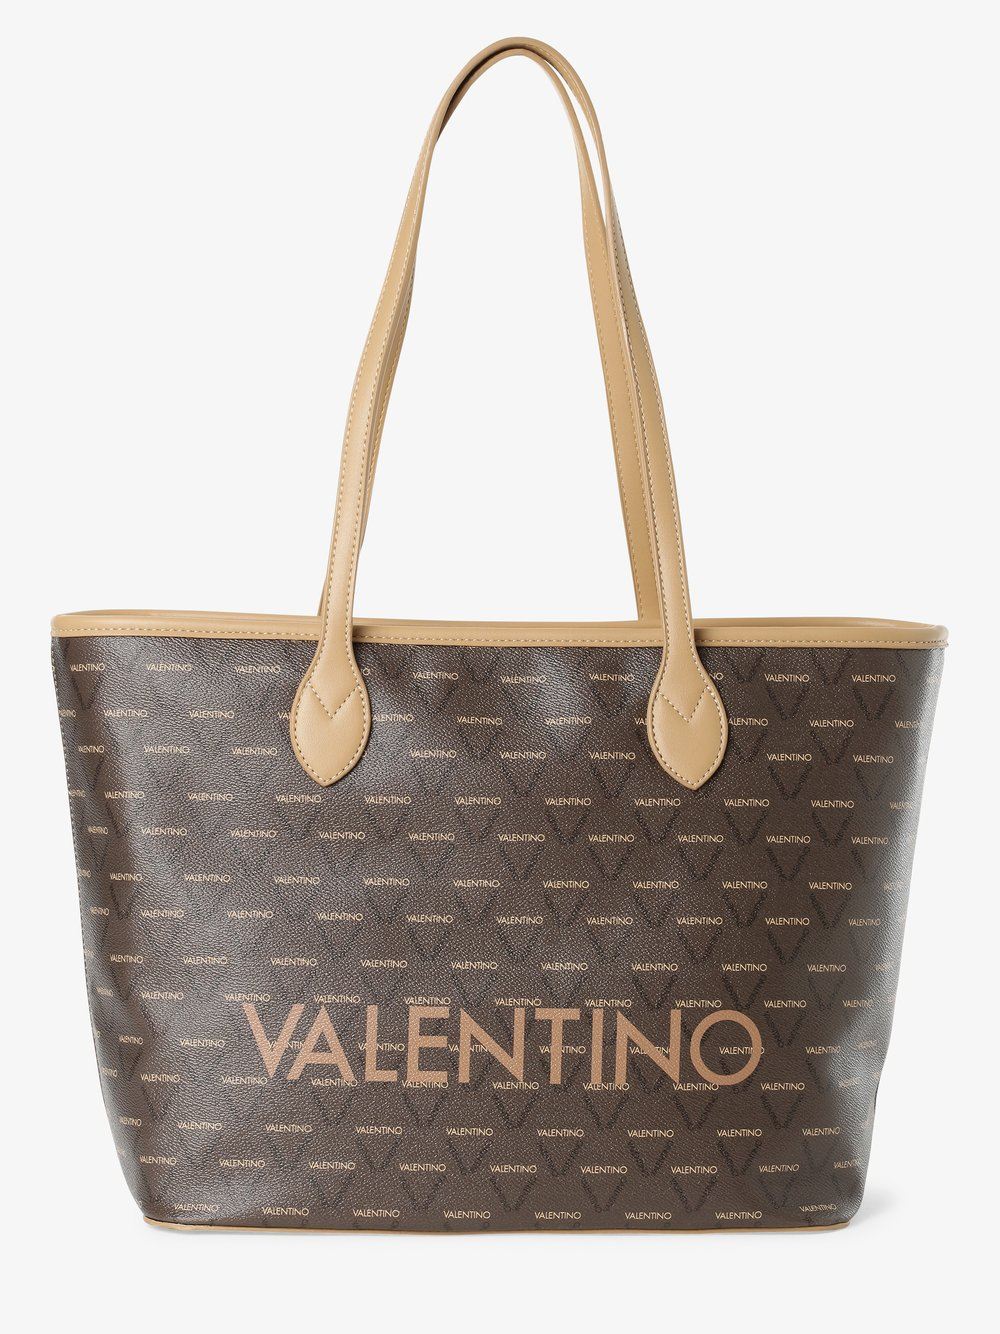 VALENTINO HANDBAGS – Damska torba shopper – Liuto, brązowy Van Graaf 444754-0002-00000